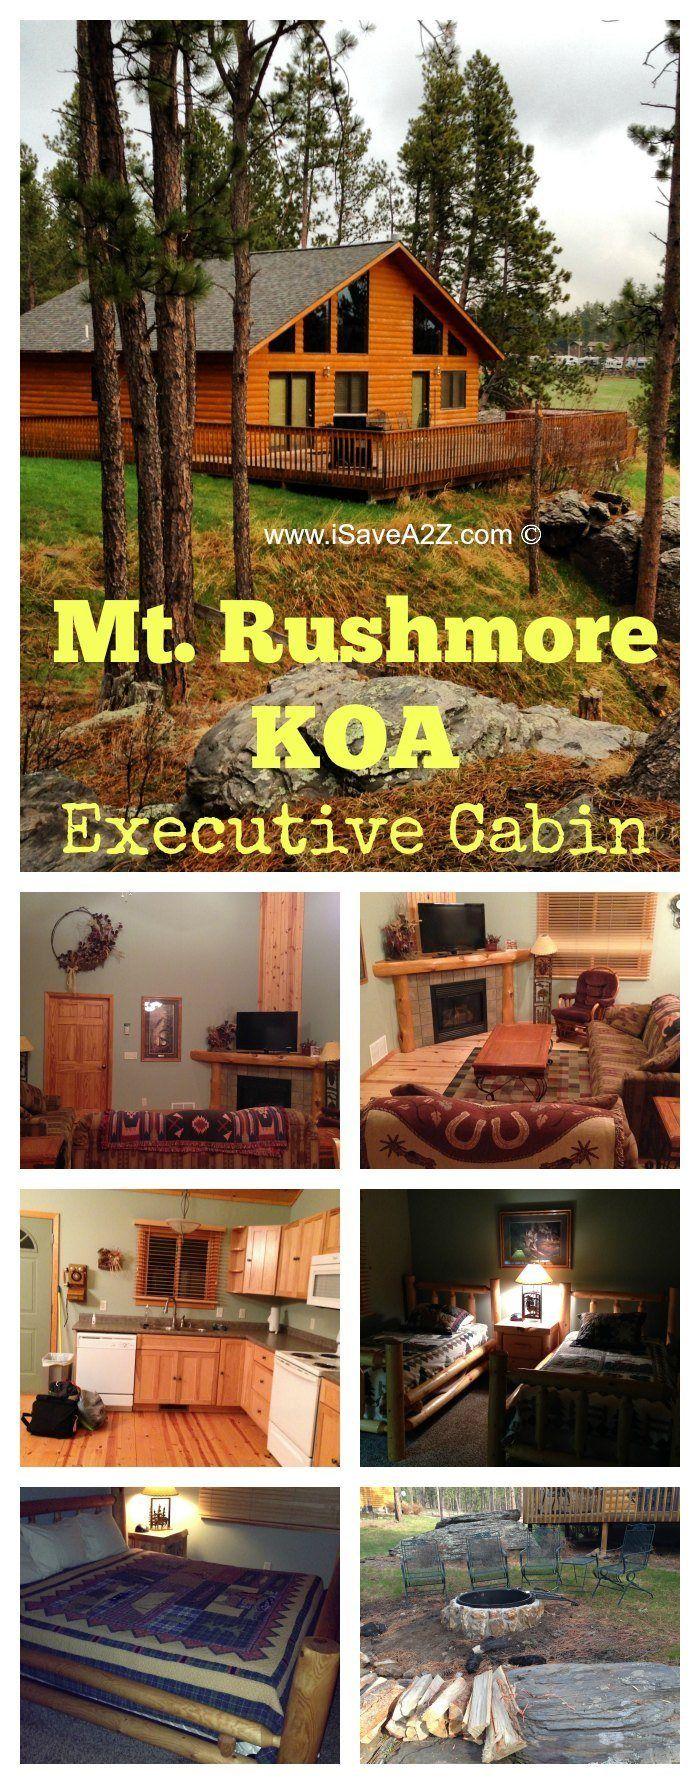 Mt. Rushmore KOA Executive Suites - iSaveA2Z.com